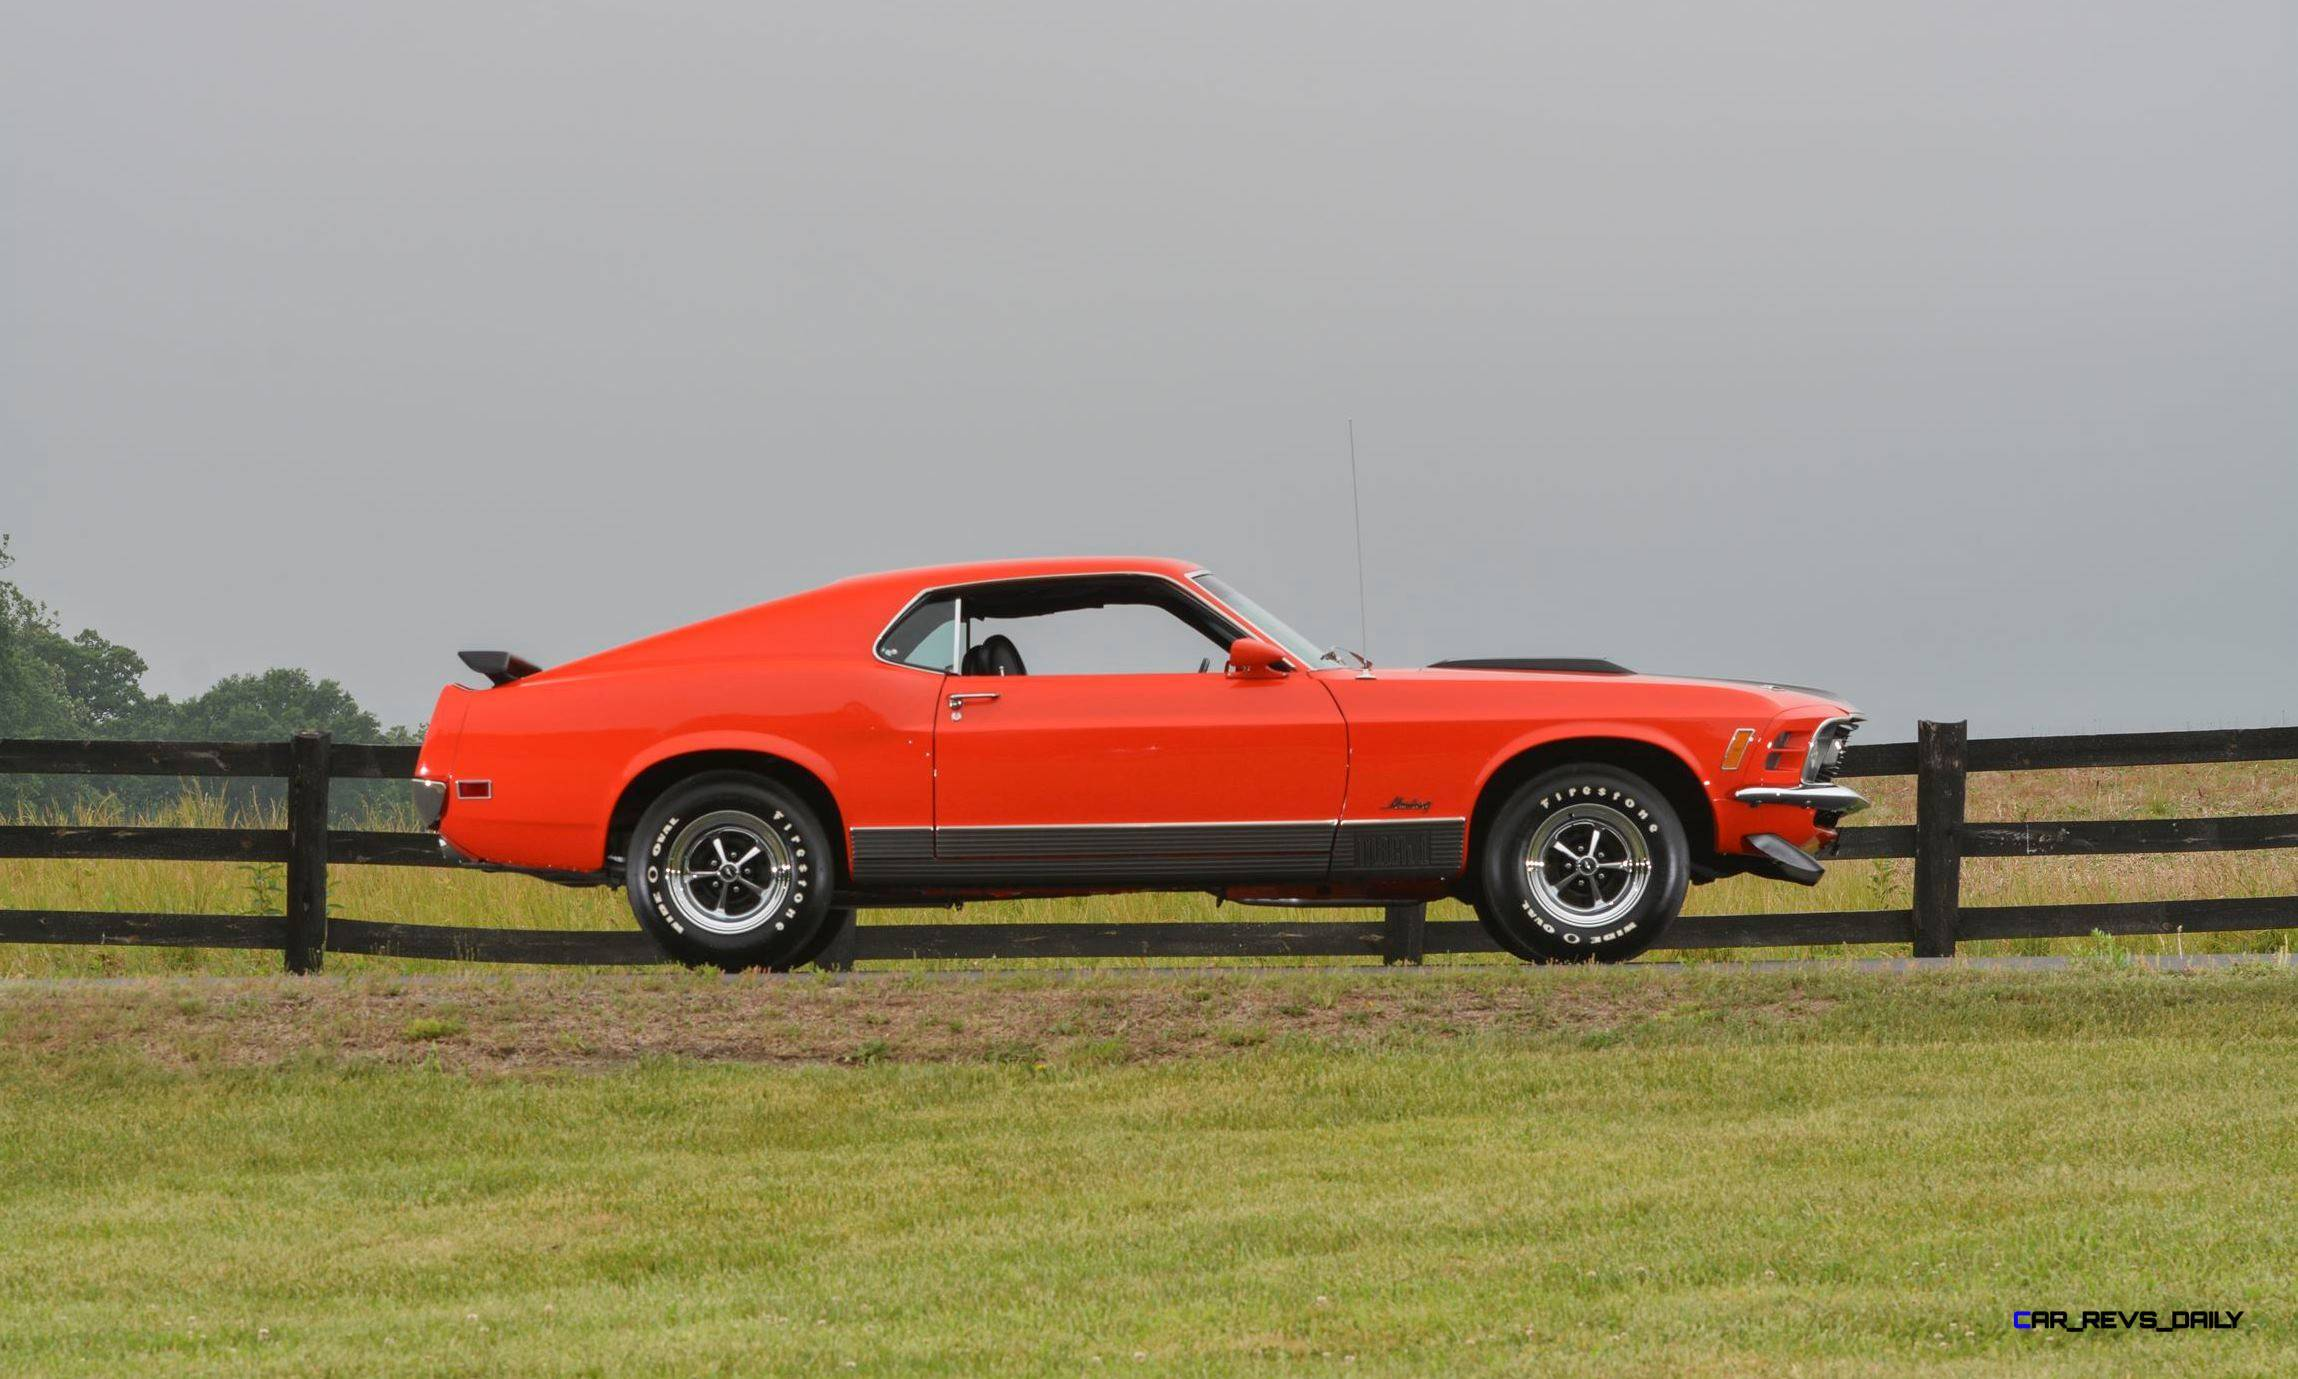 Mecum Harrisburg 2015 114_1970 Ford Mustang Mach 1 Fastback 12